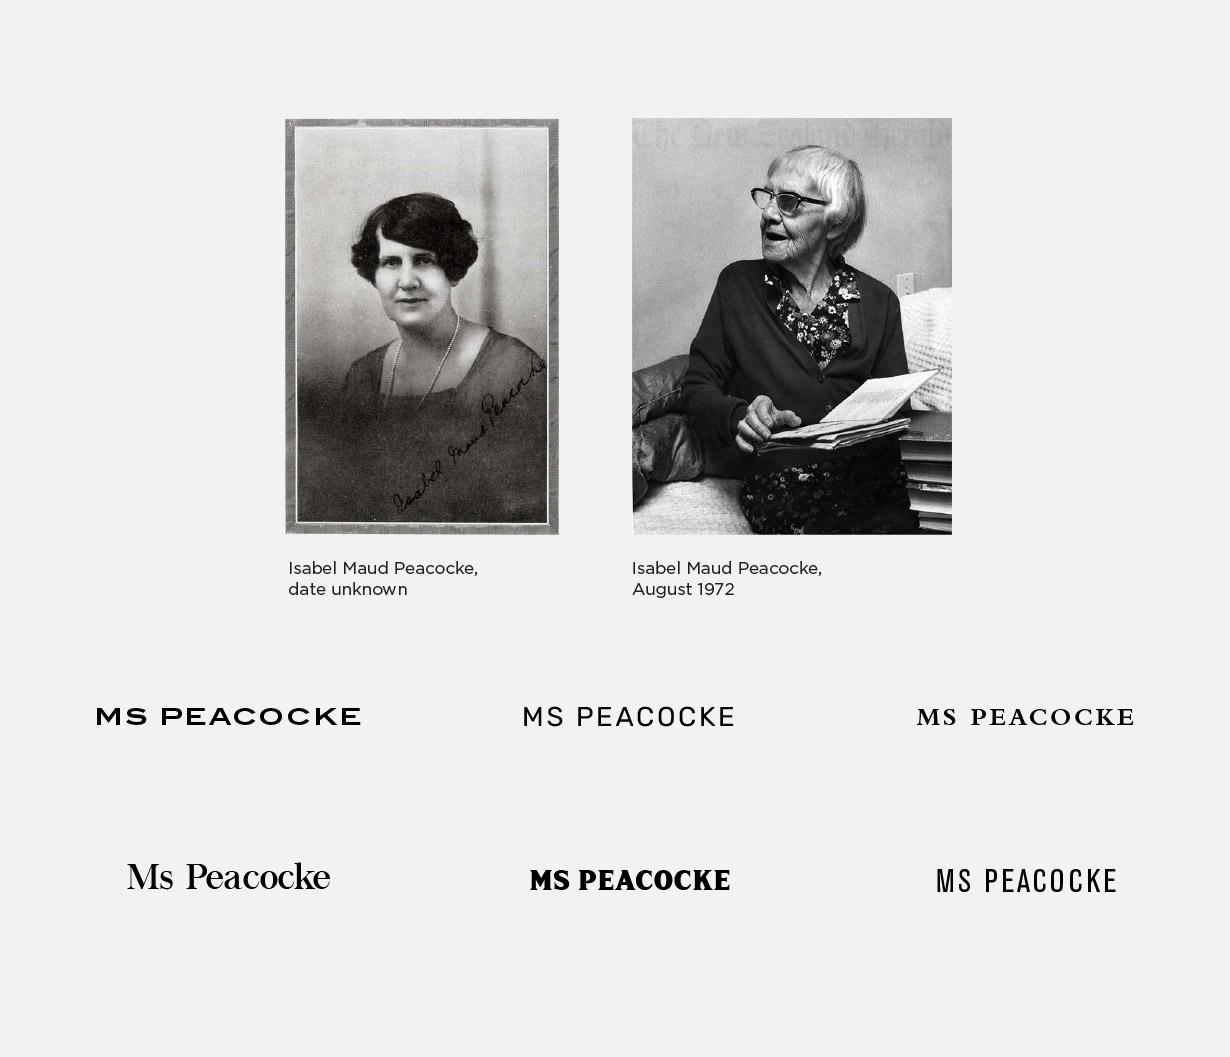 sh-peacocke